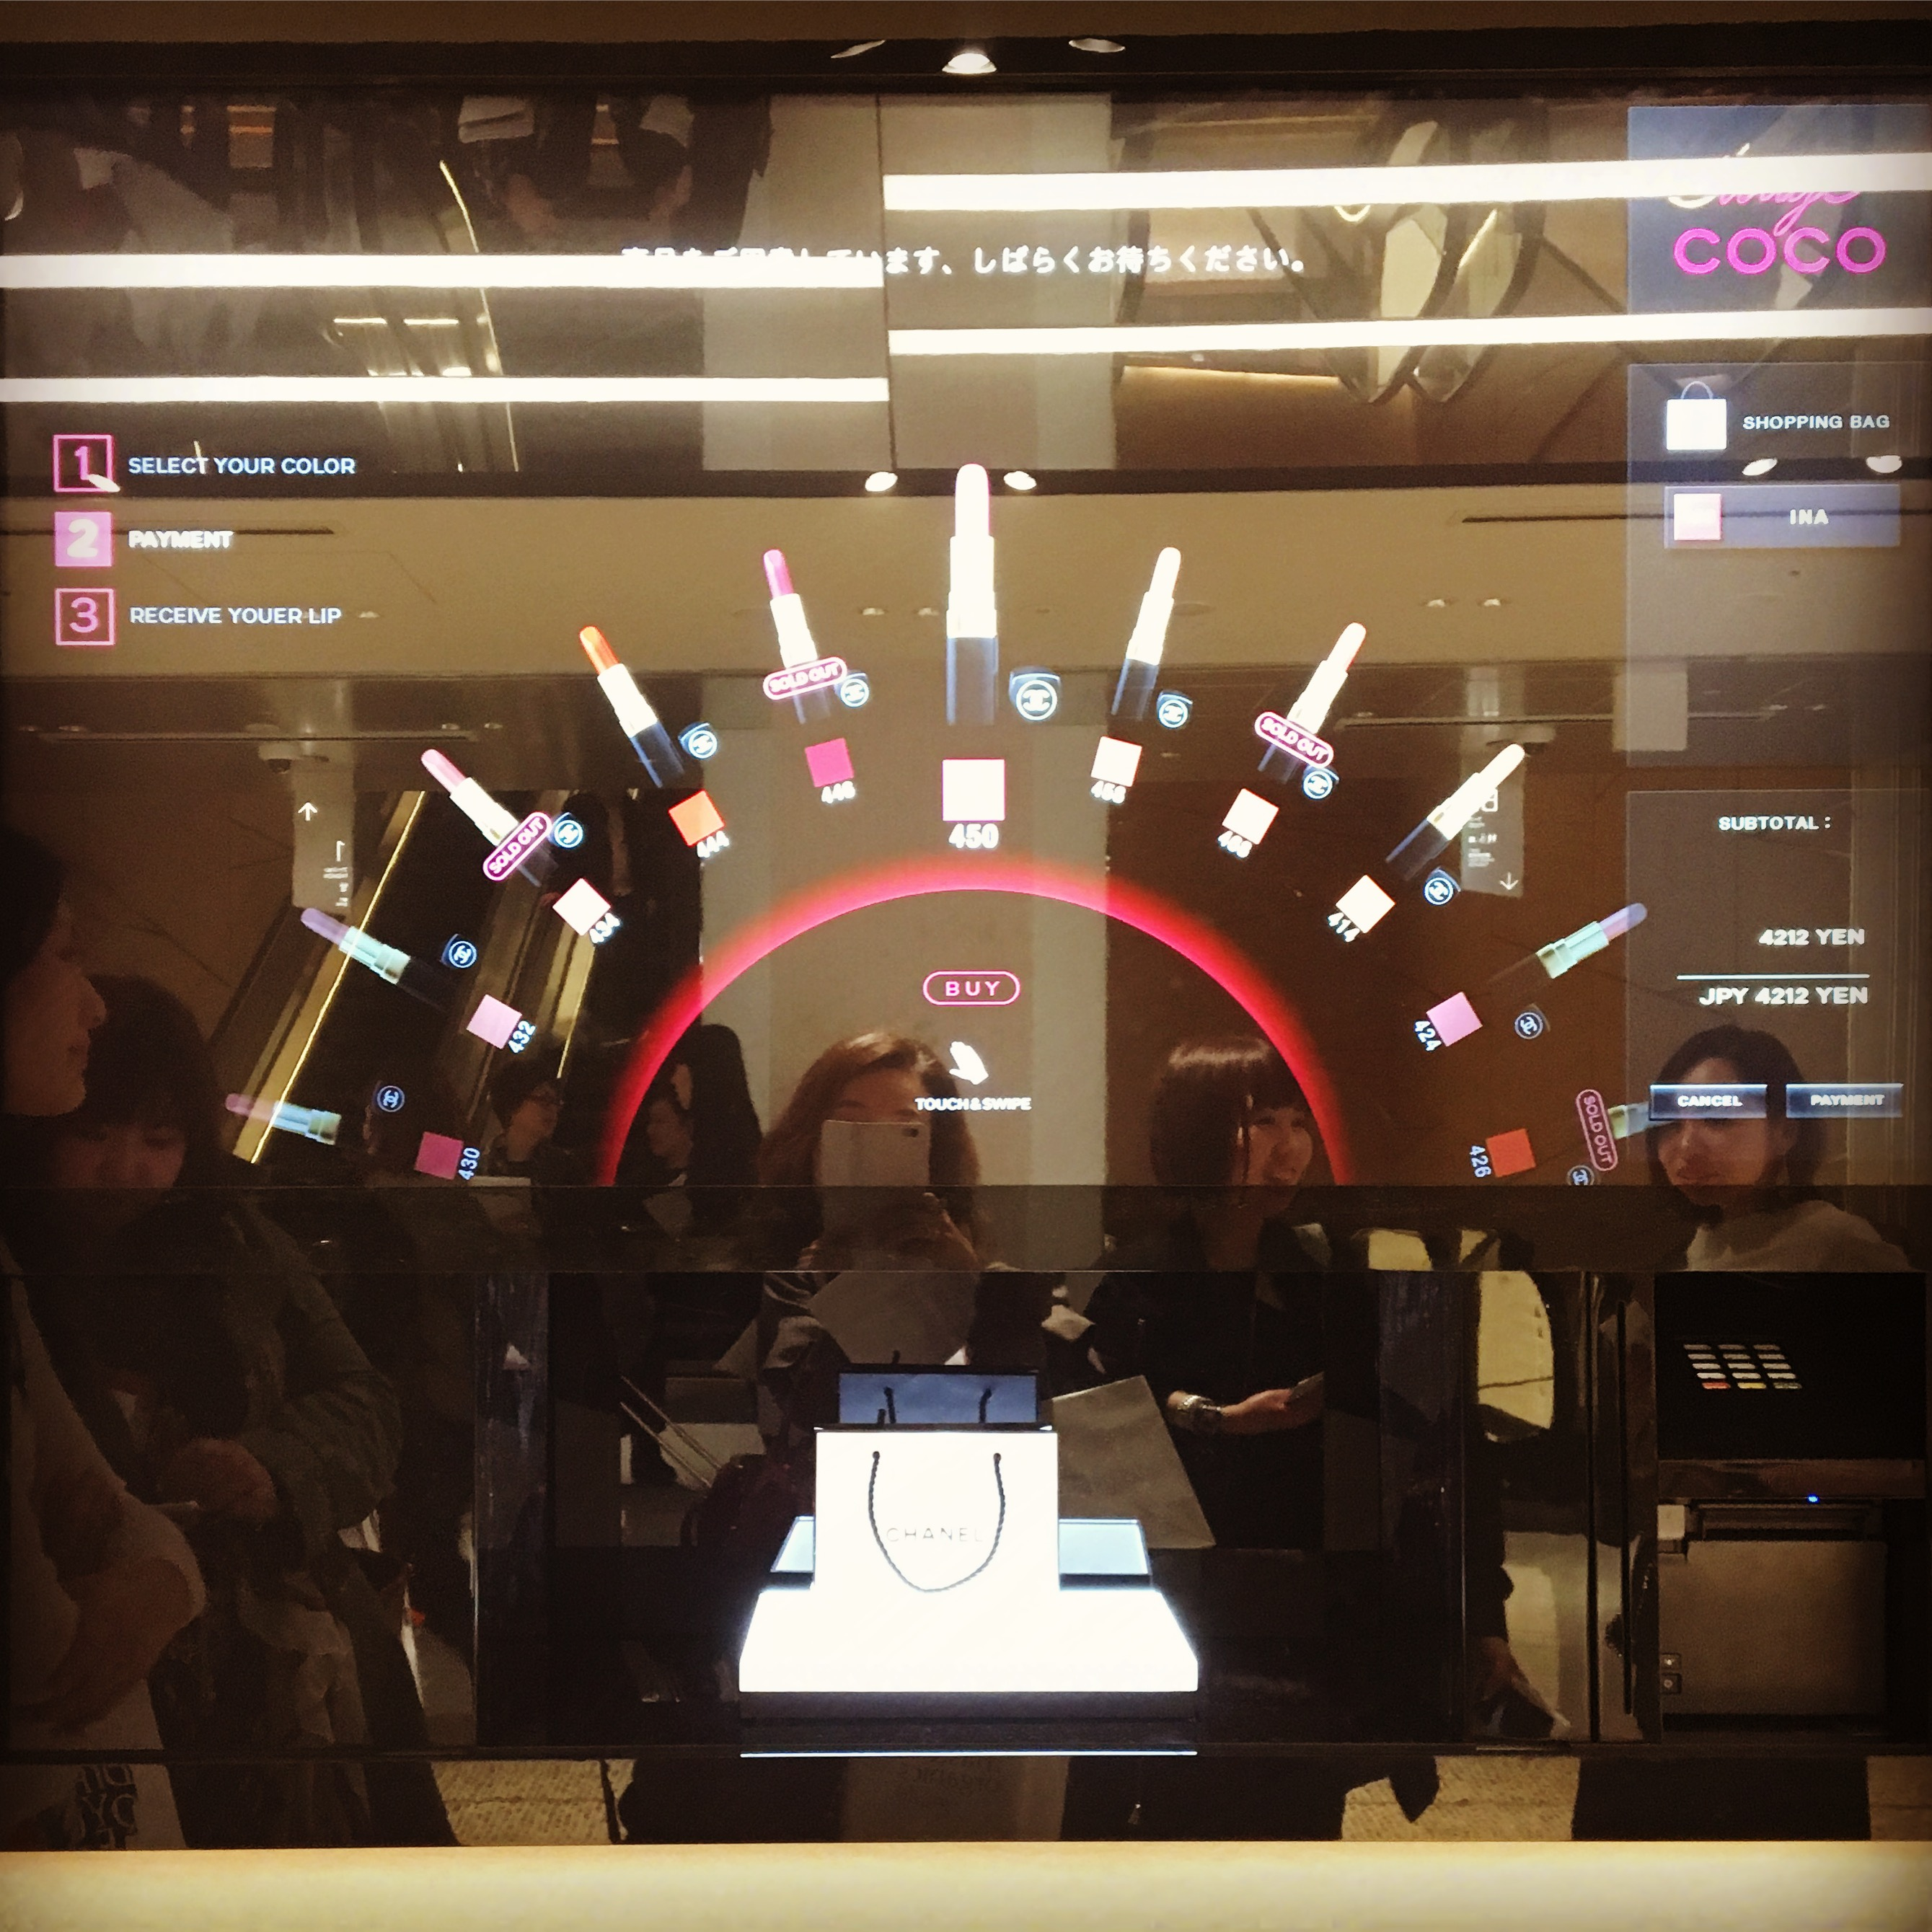 Chanel シャネル 自動販売機 世界初